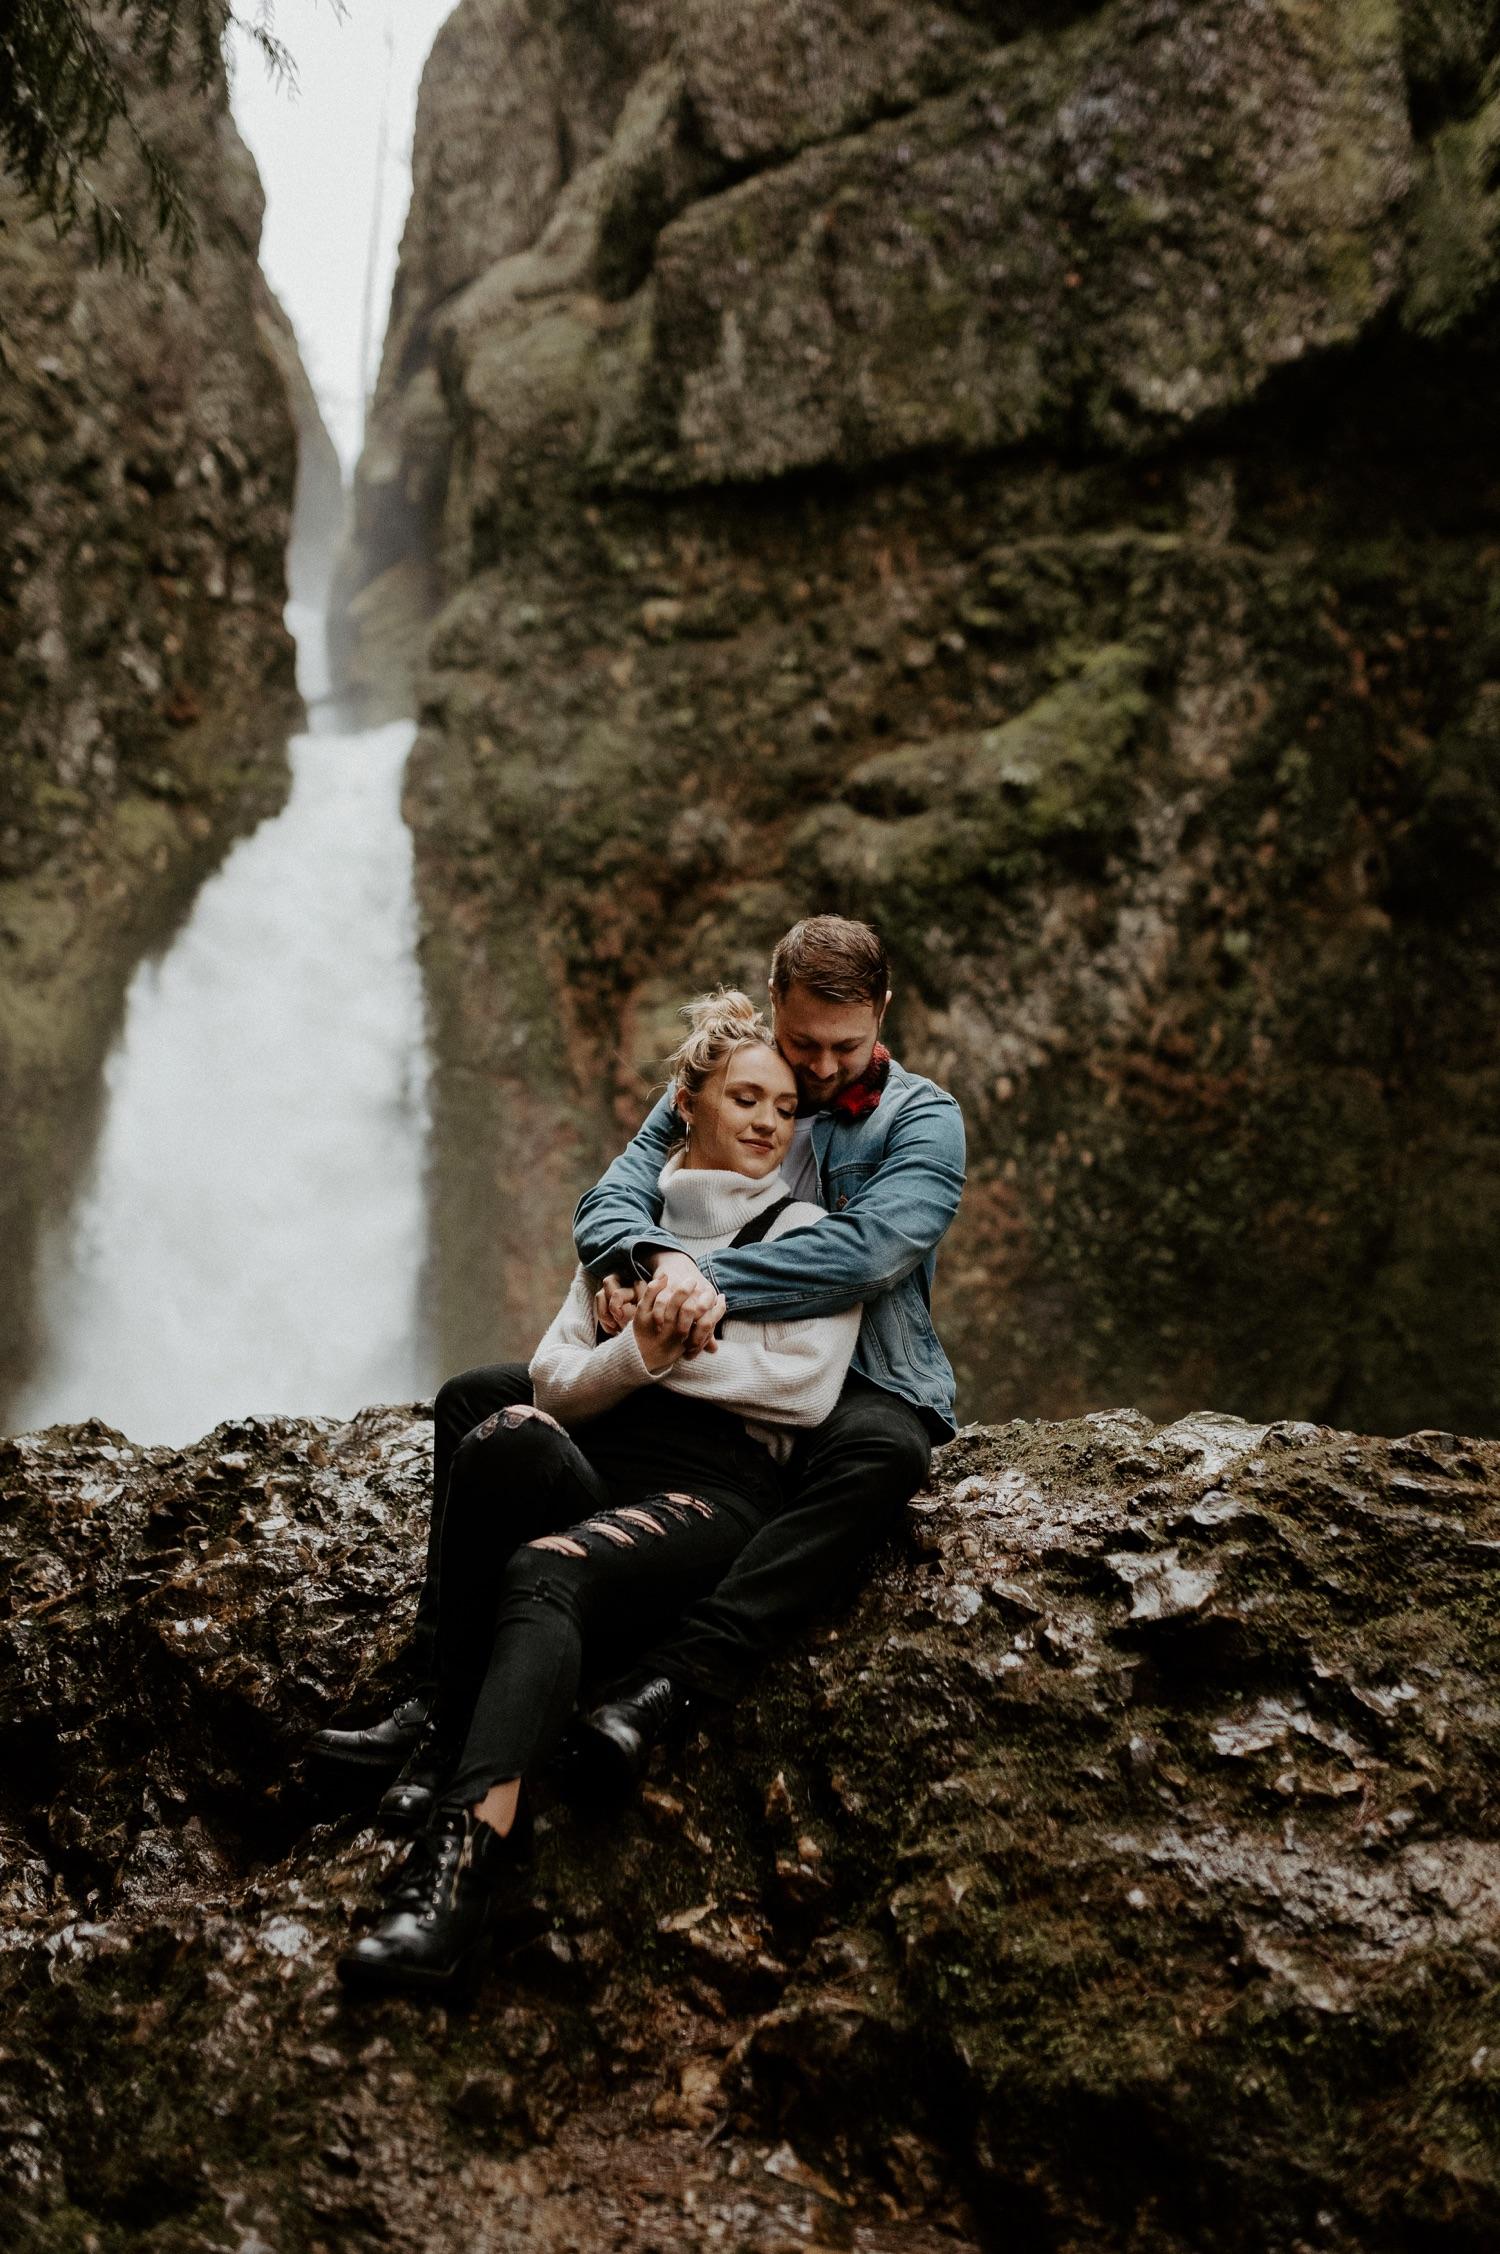 Wahclella Falls Engagement Session Columbia River Gorge Oregon Portland Wedding Photographer Anais Possamai Photography 029